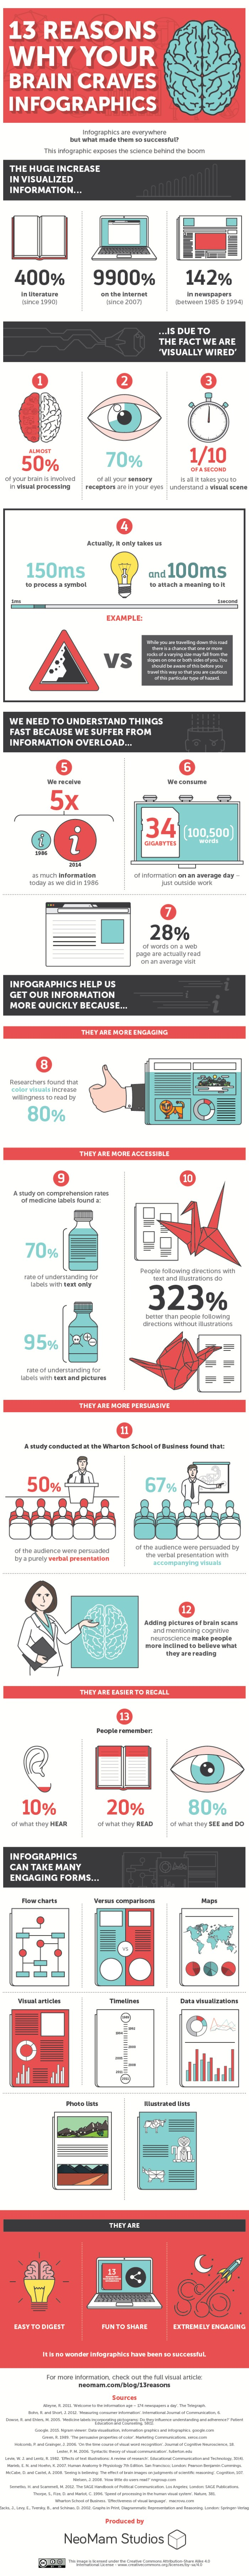 advanced SEO techniques use infographics